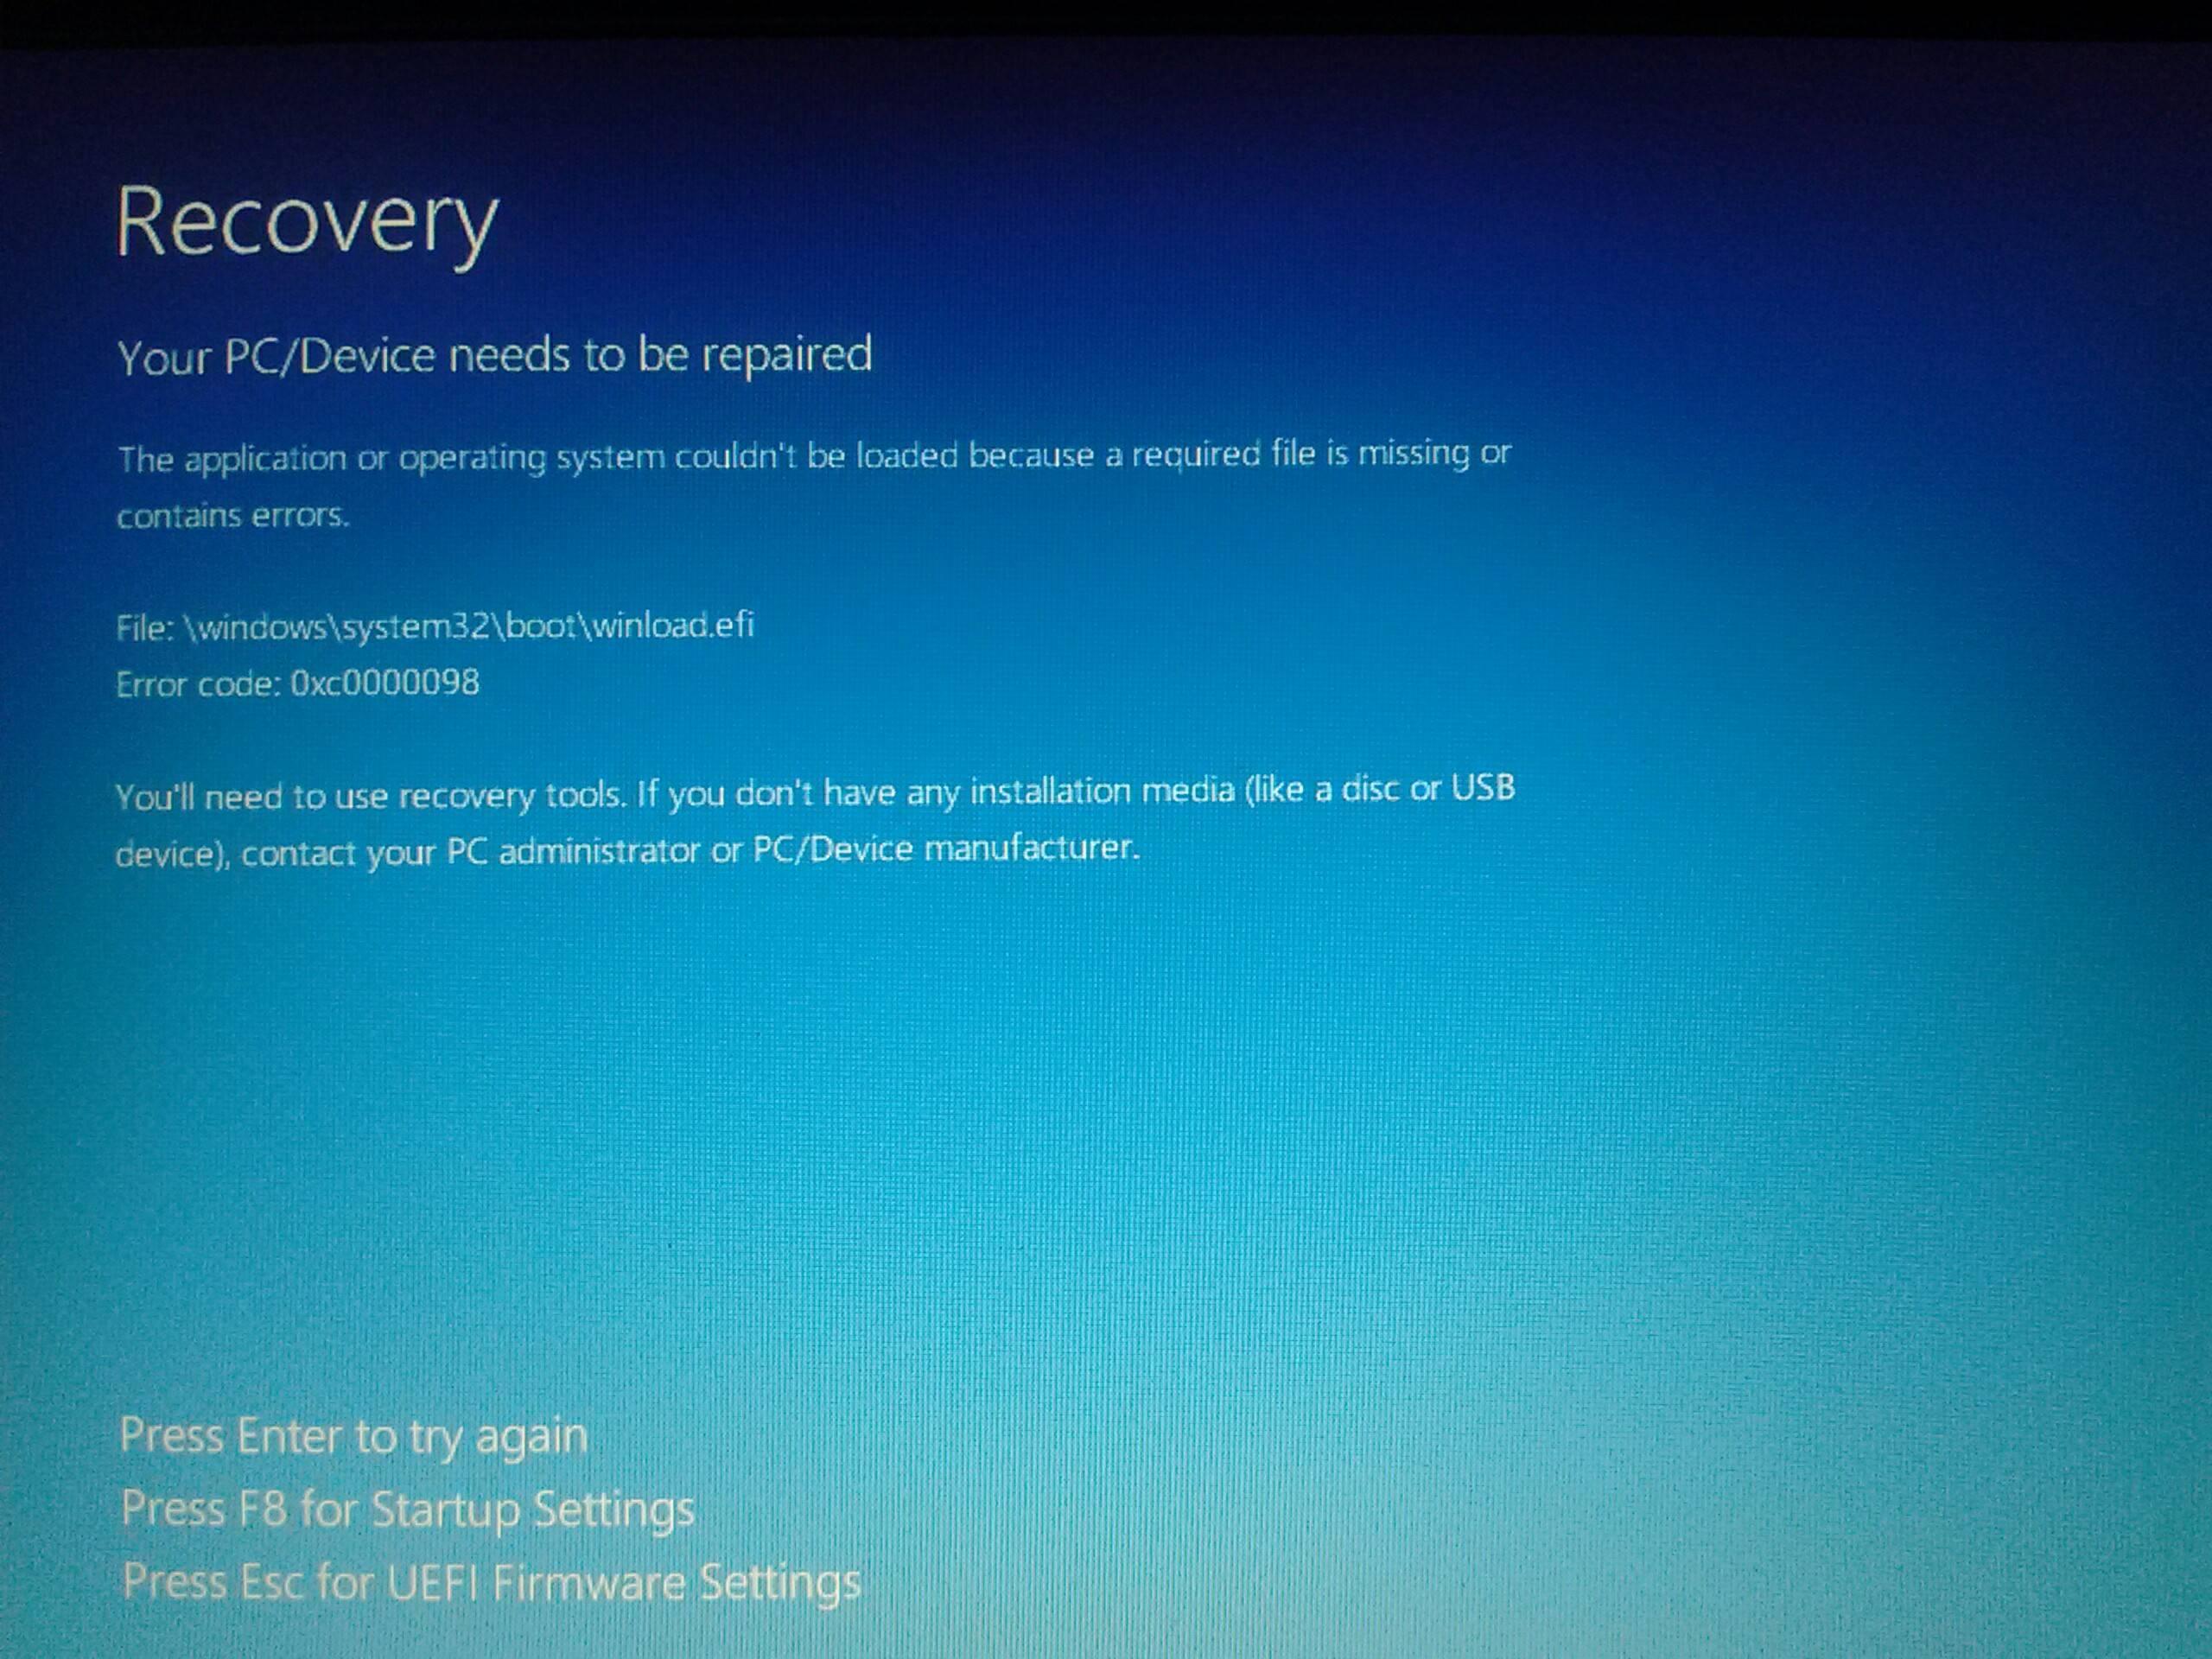 64 bit - Windows 10 installation winload.efi error - Super User